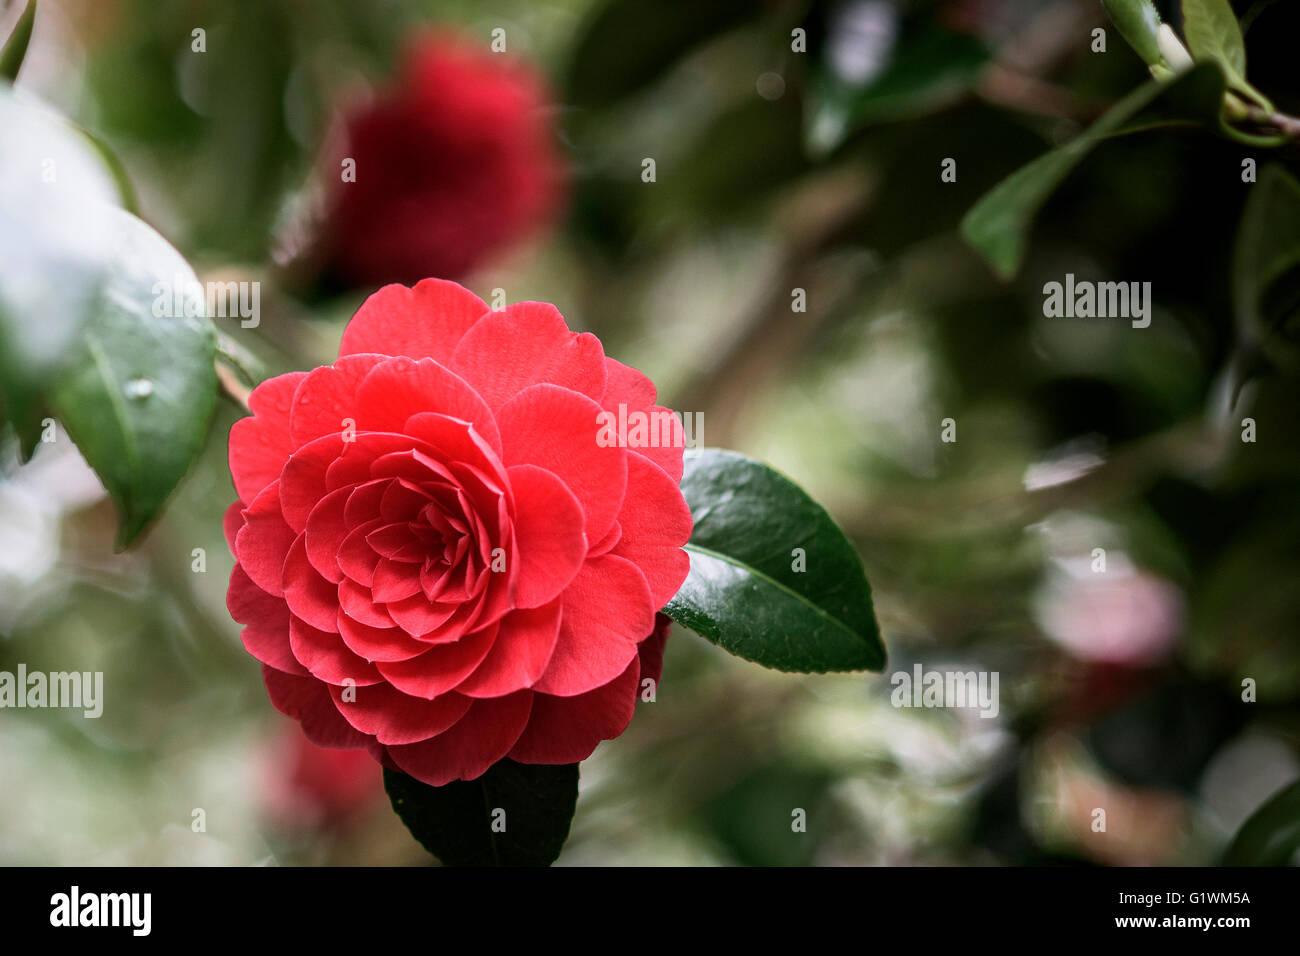 Camellia Japonica. Imbricata rubra. - Stock Image